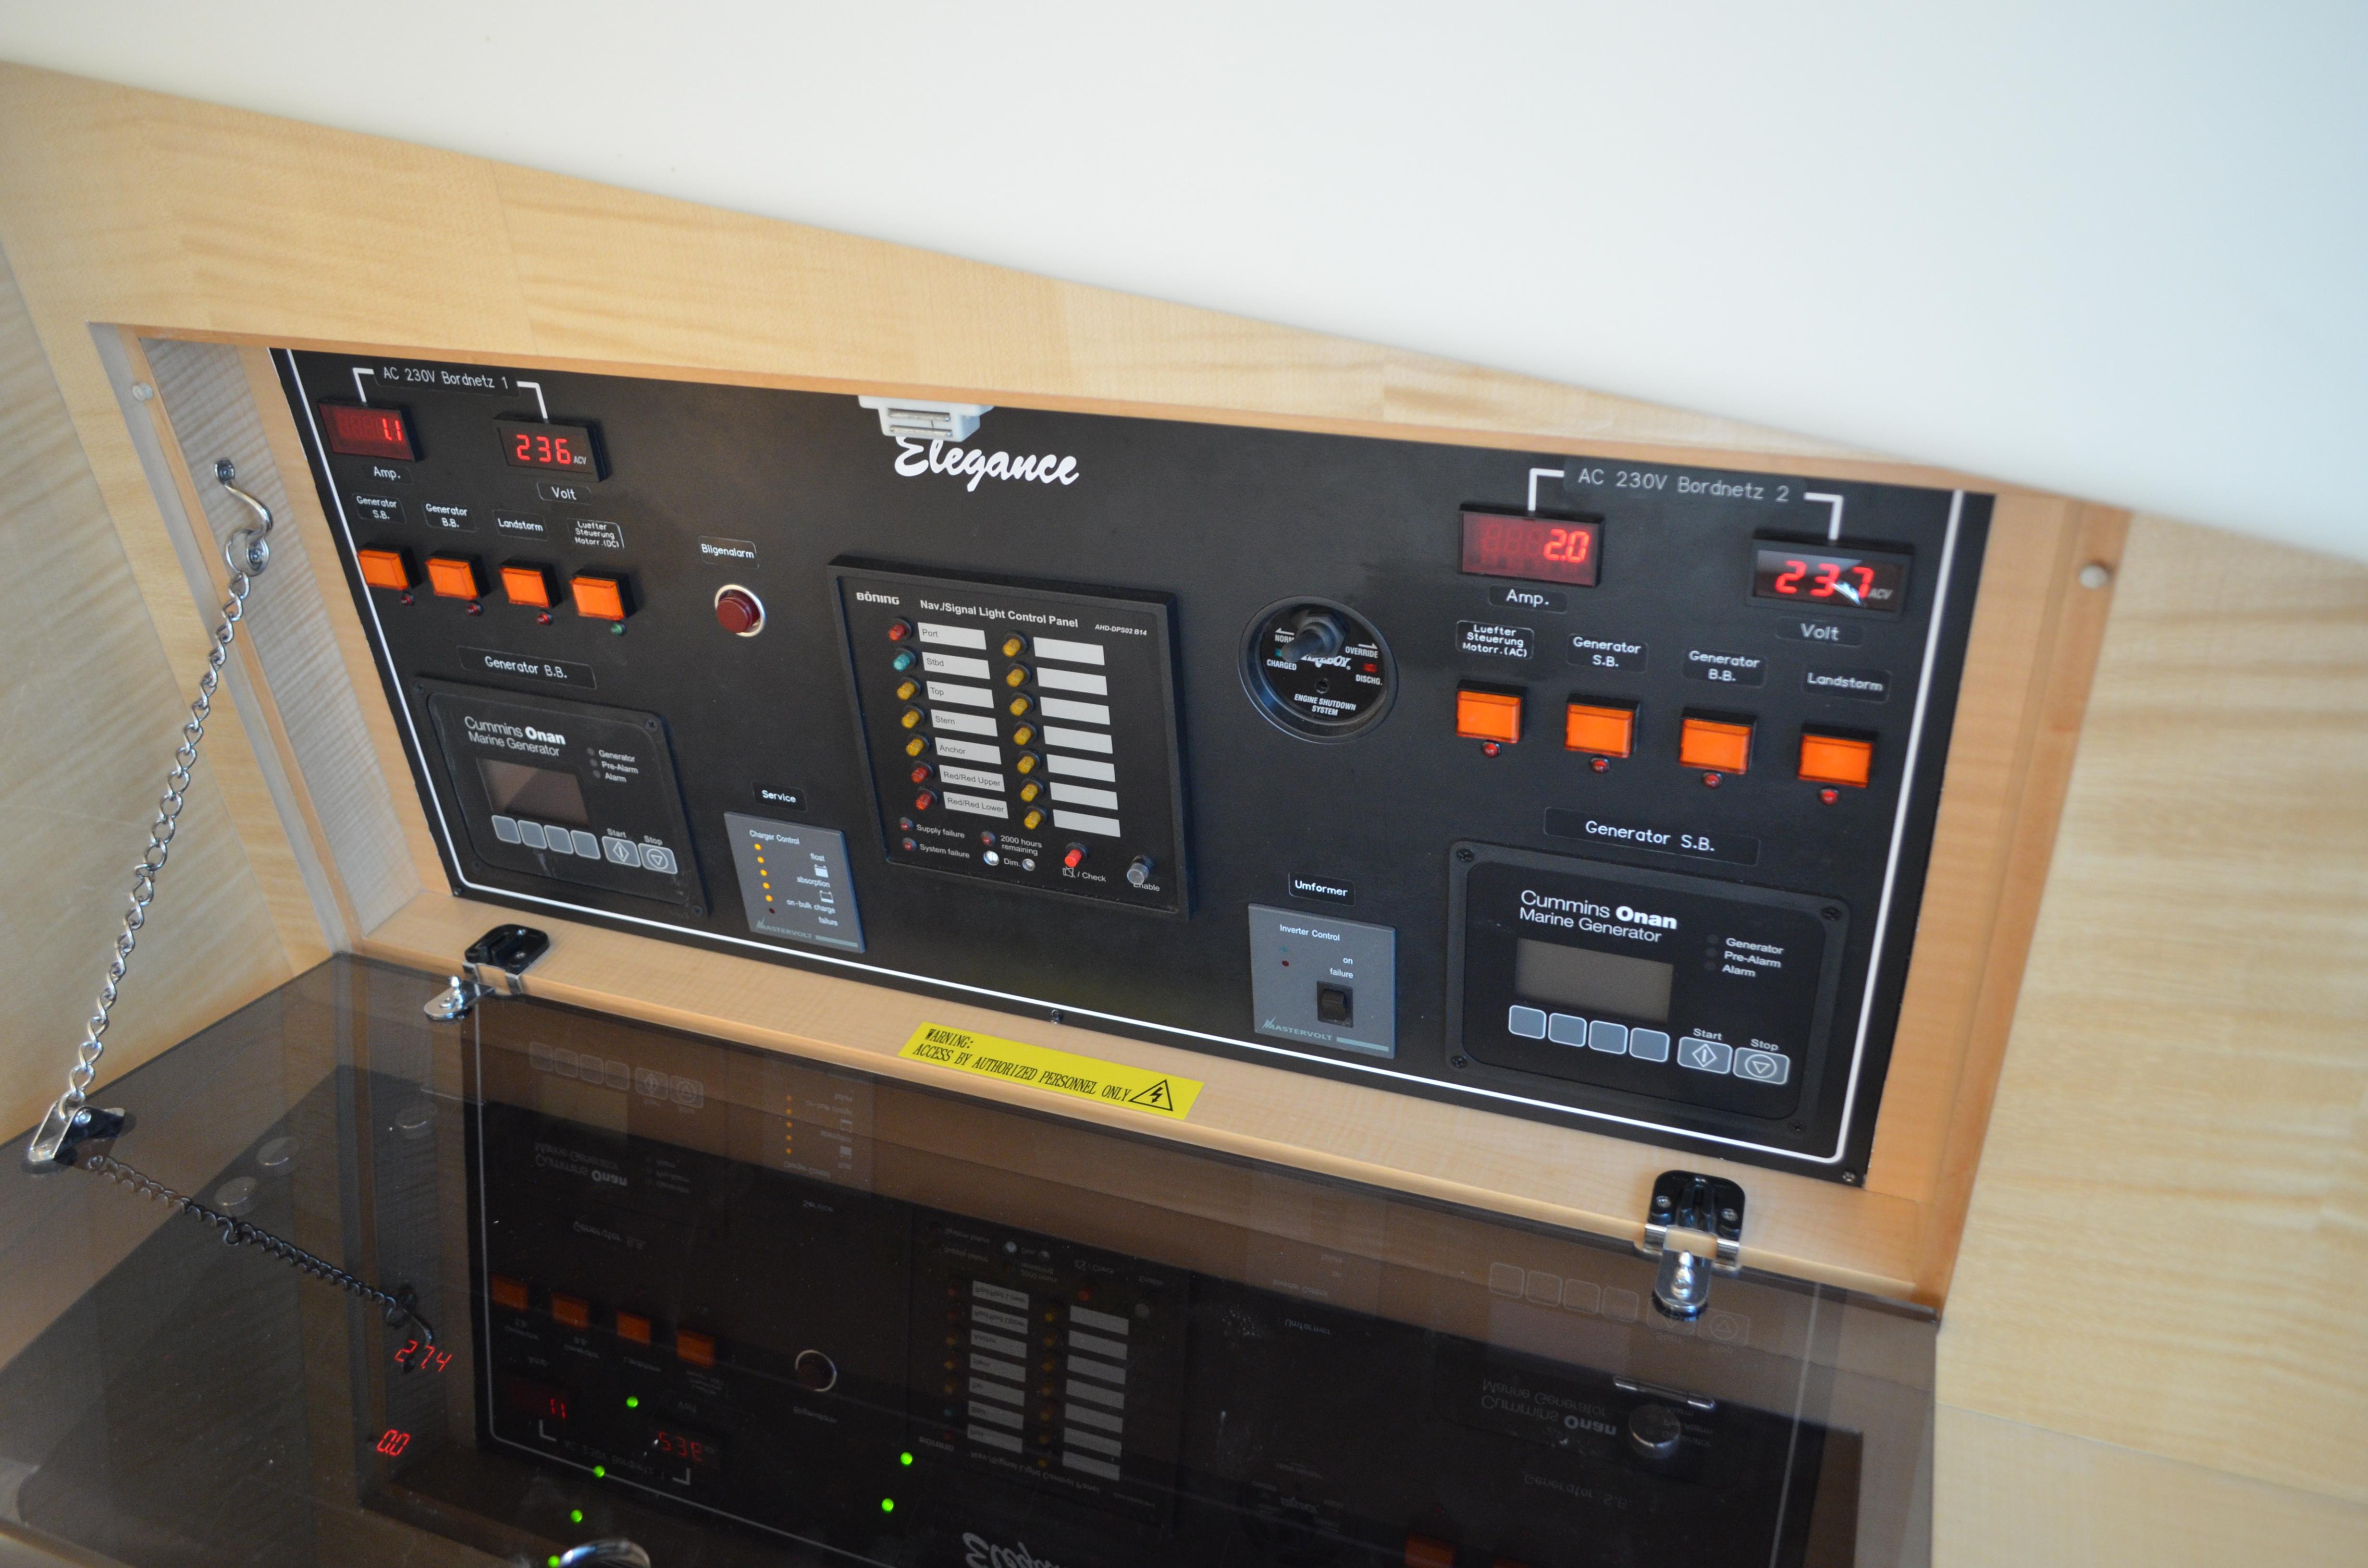 Generator / inverter controls